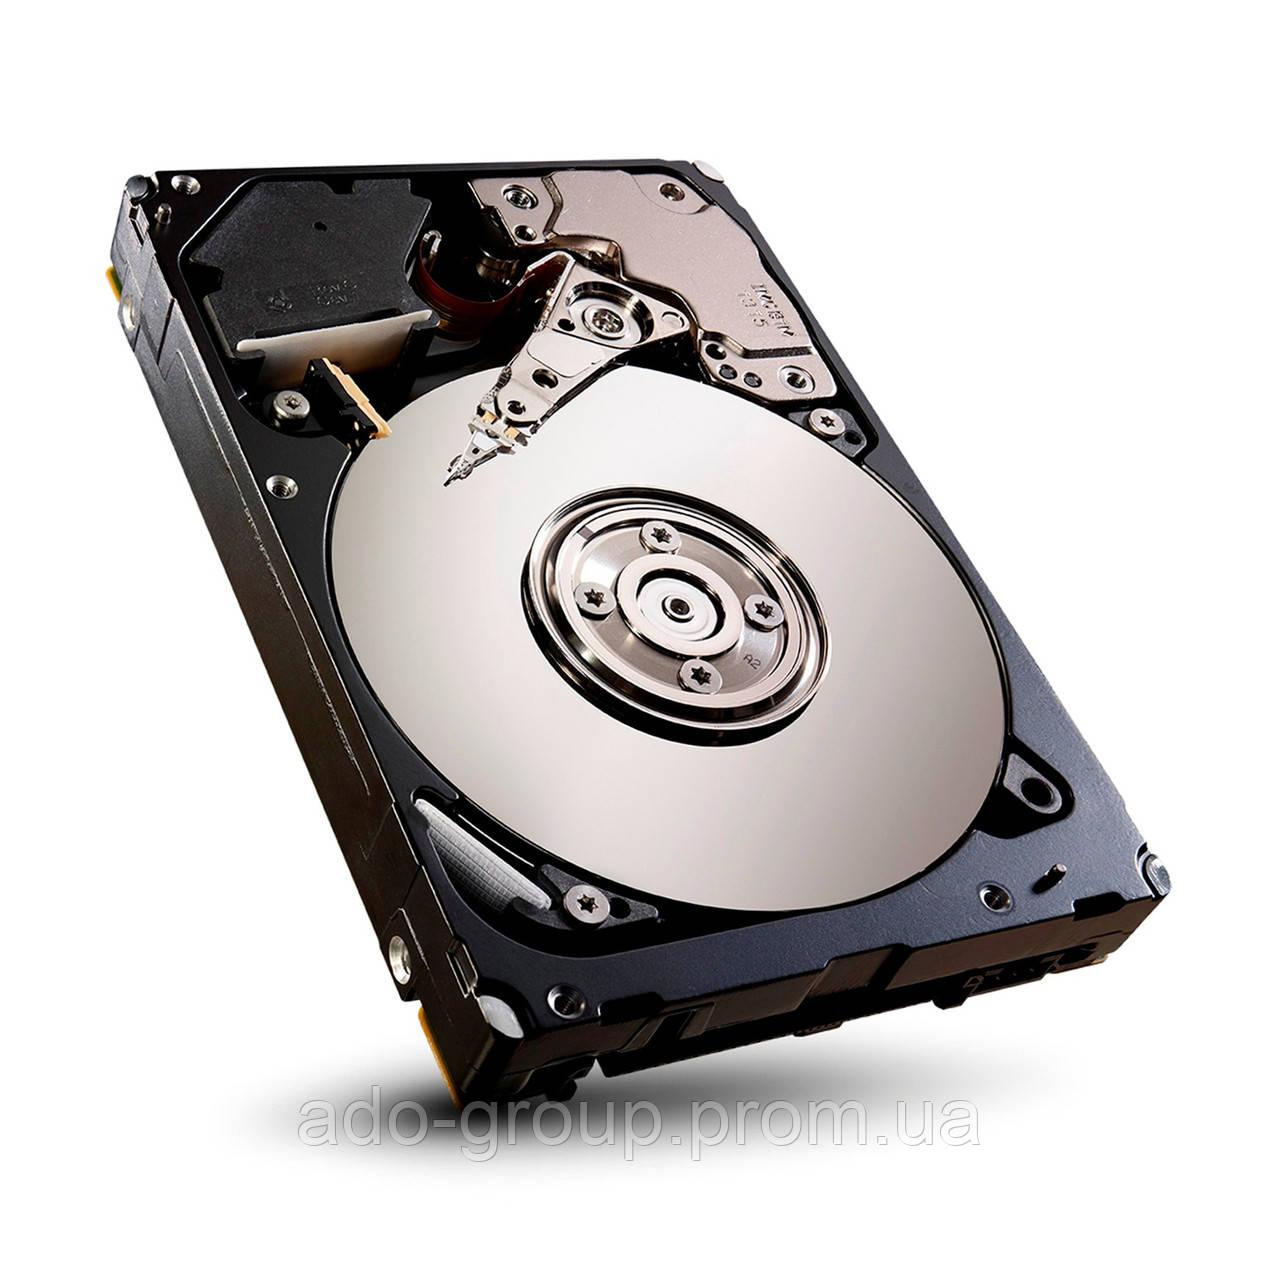 "J4449 Жесткий диск Dell 36GB SCSI 15K U320 3.5"" +"